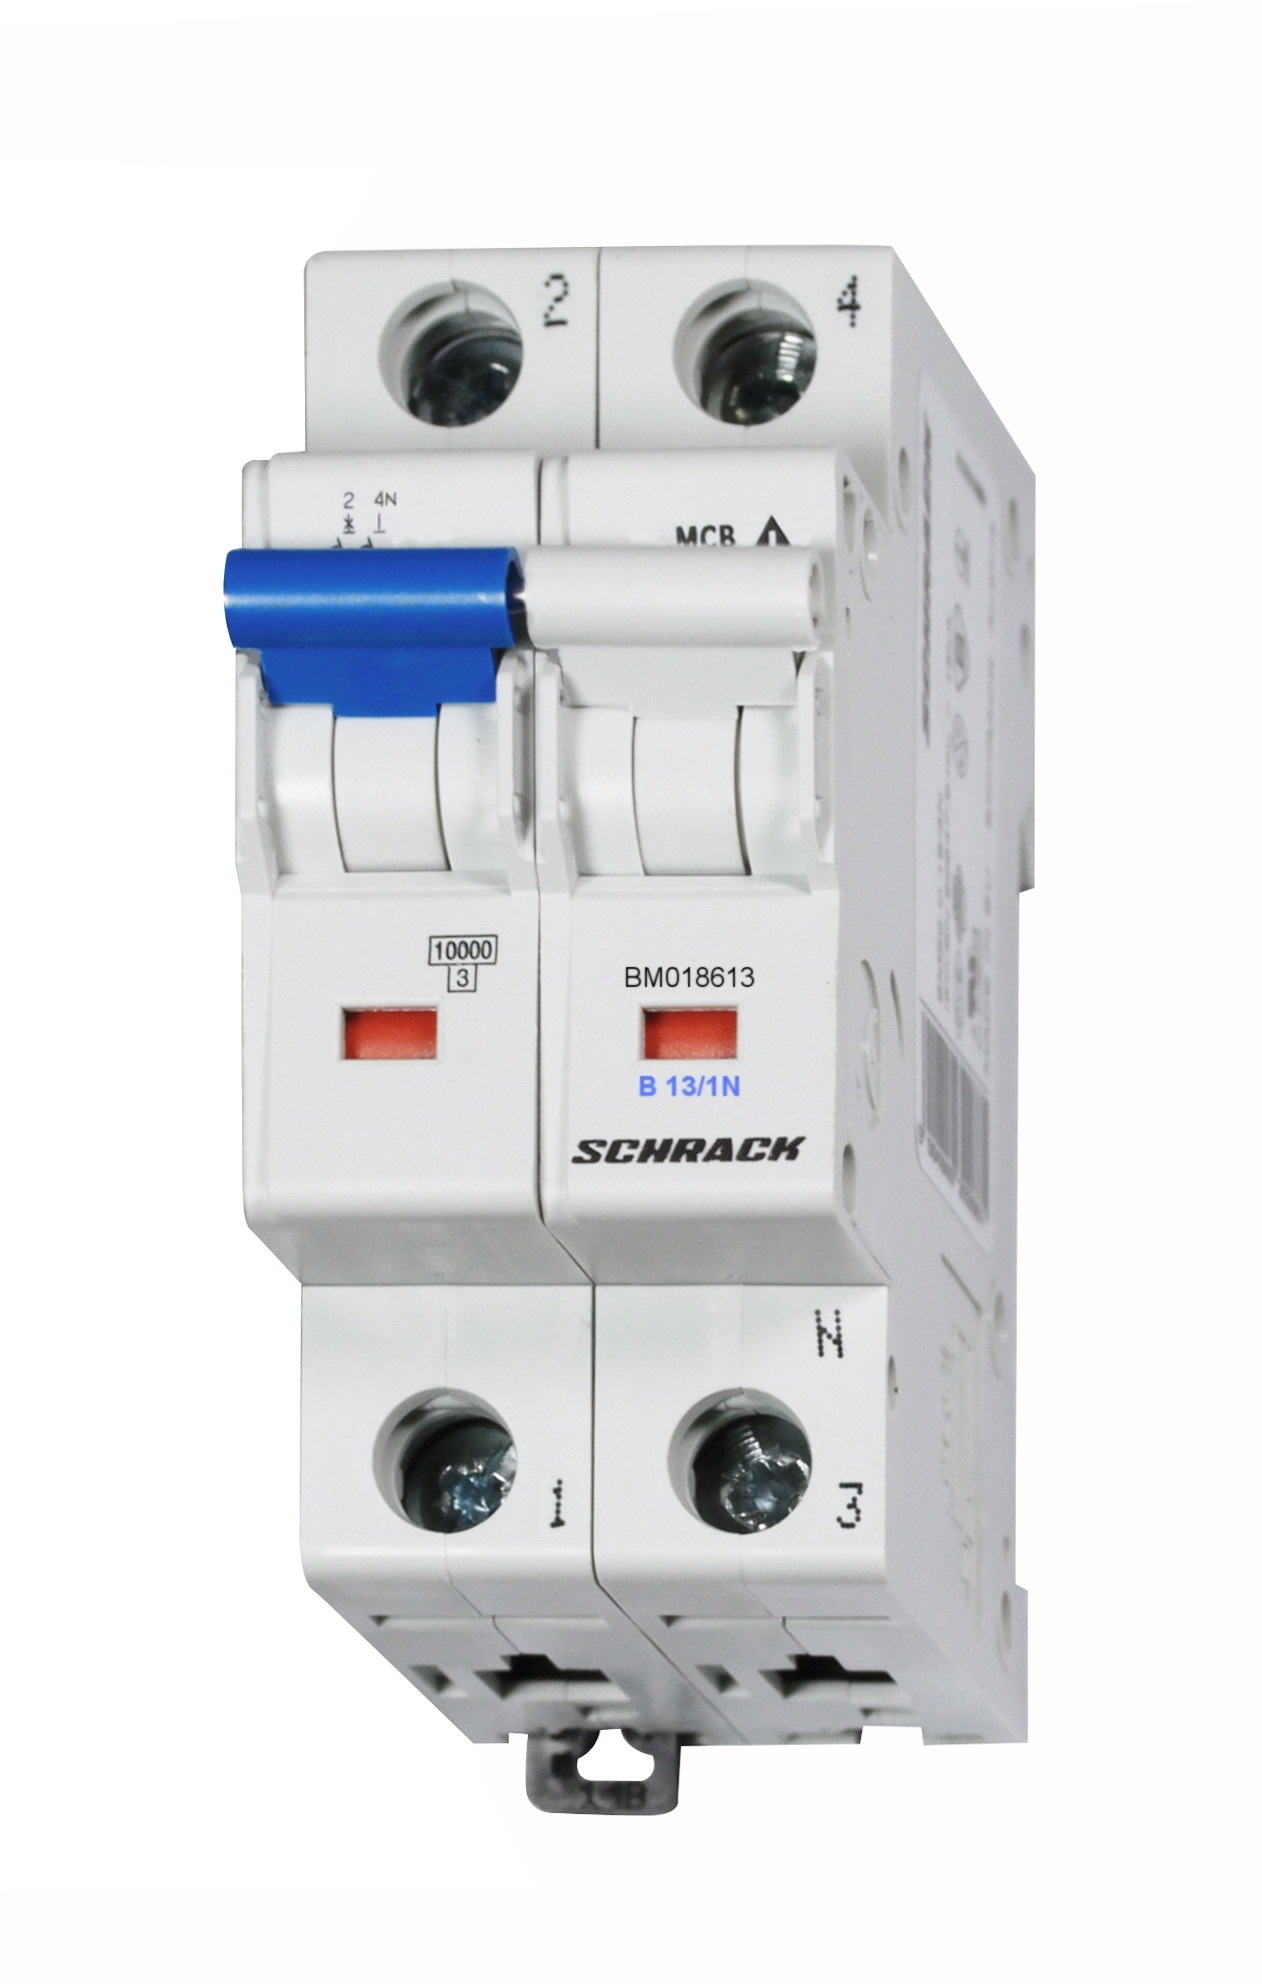 BM018613 - Schrack Technik